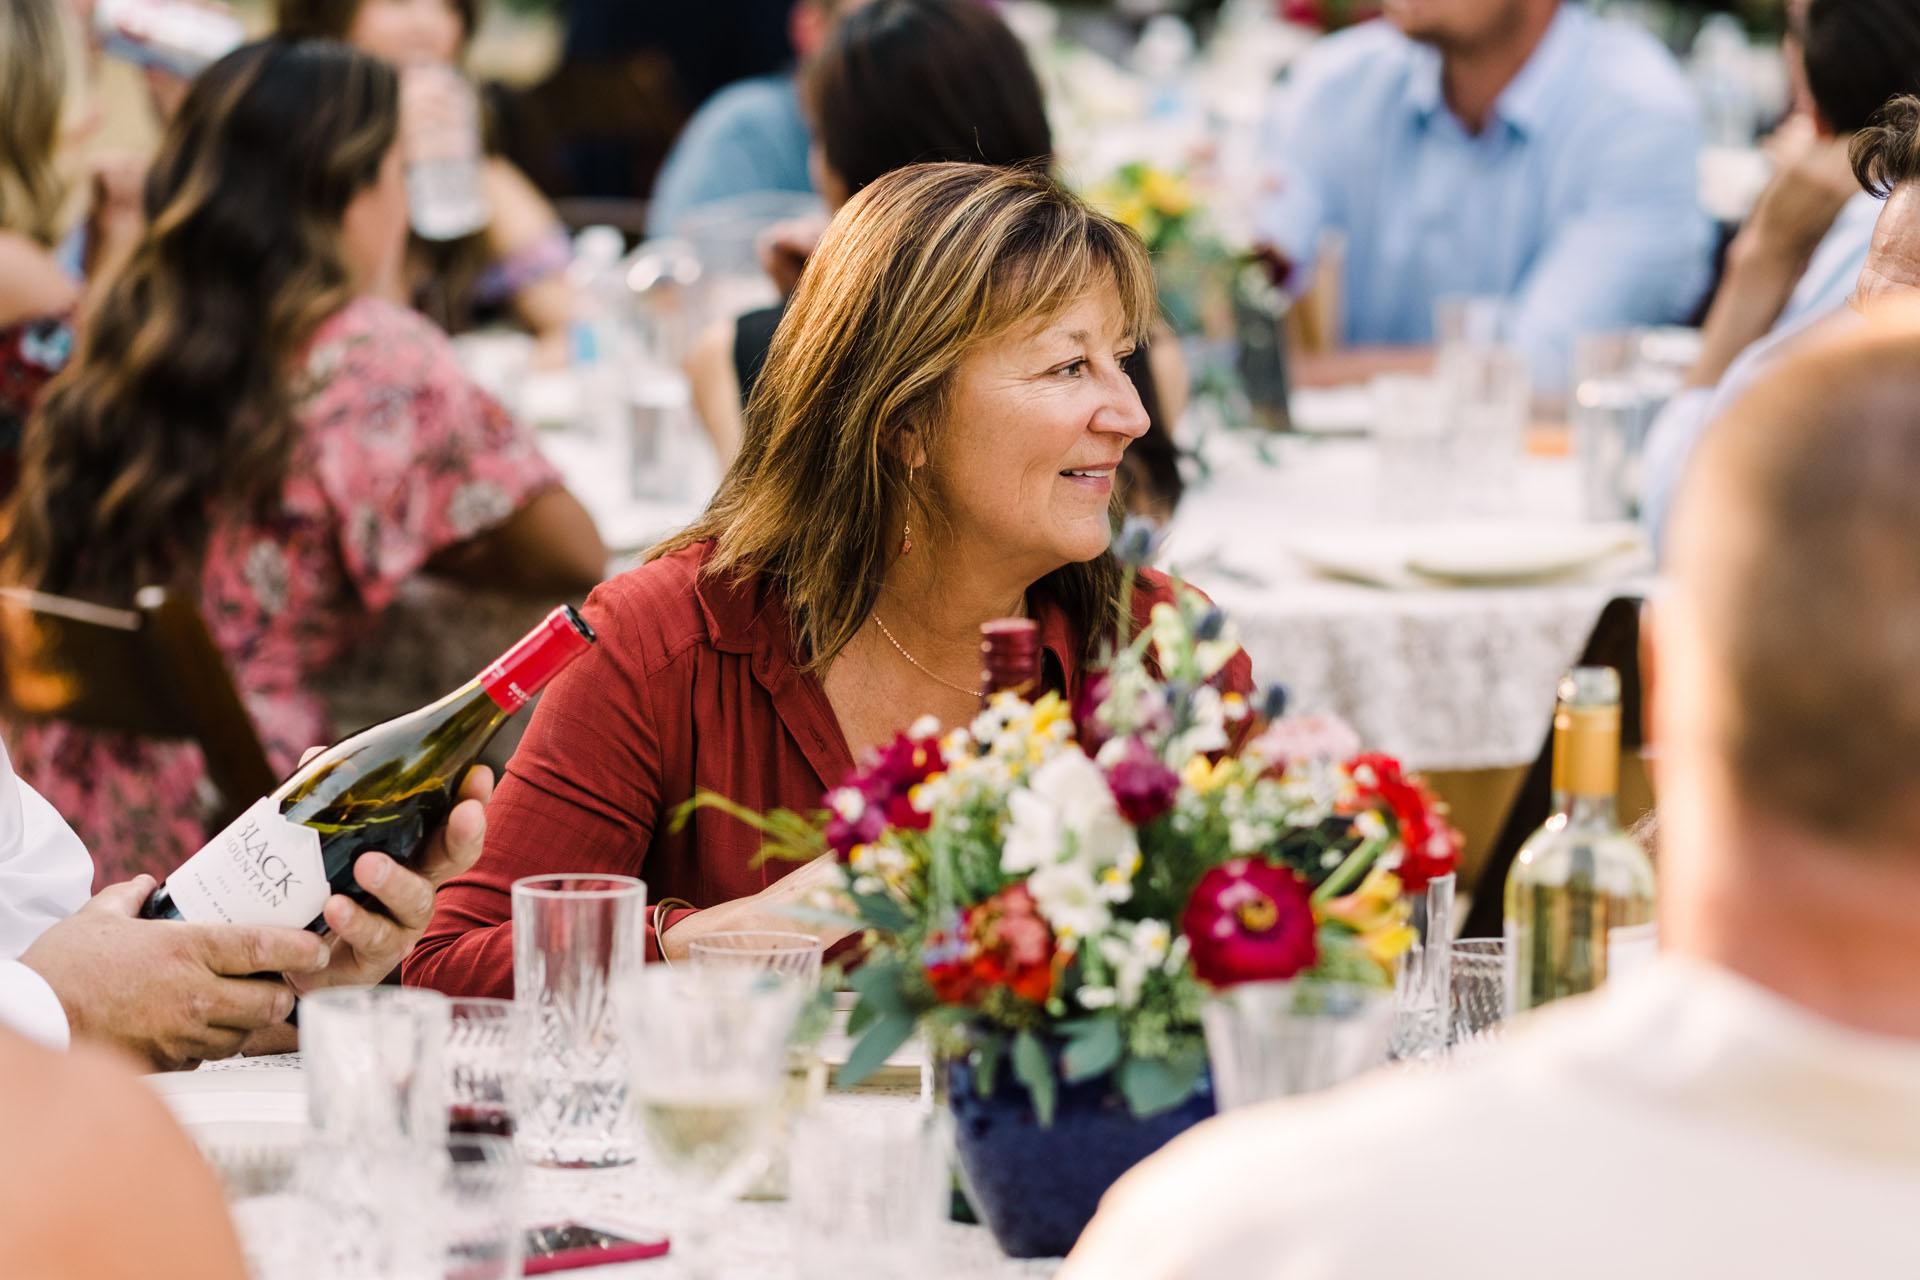 10-7-17 Devon and Jordan's Wedding-154.jpg